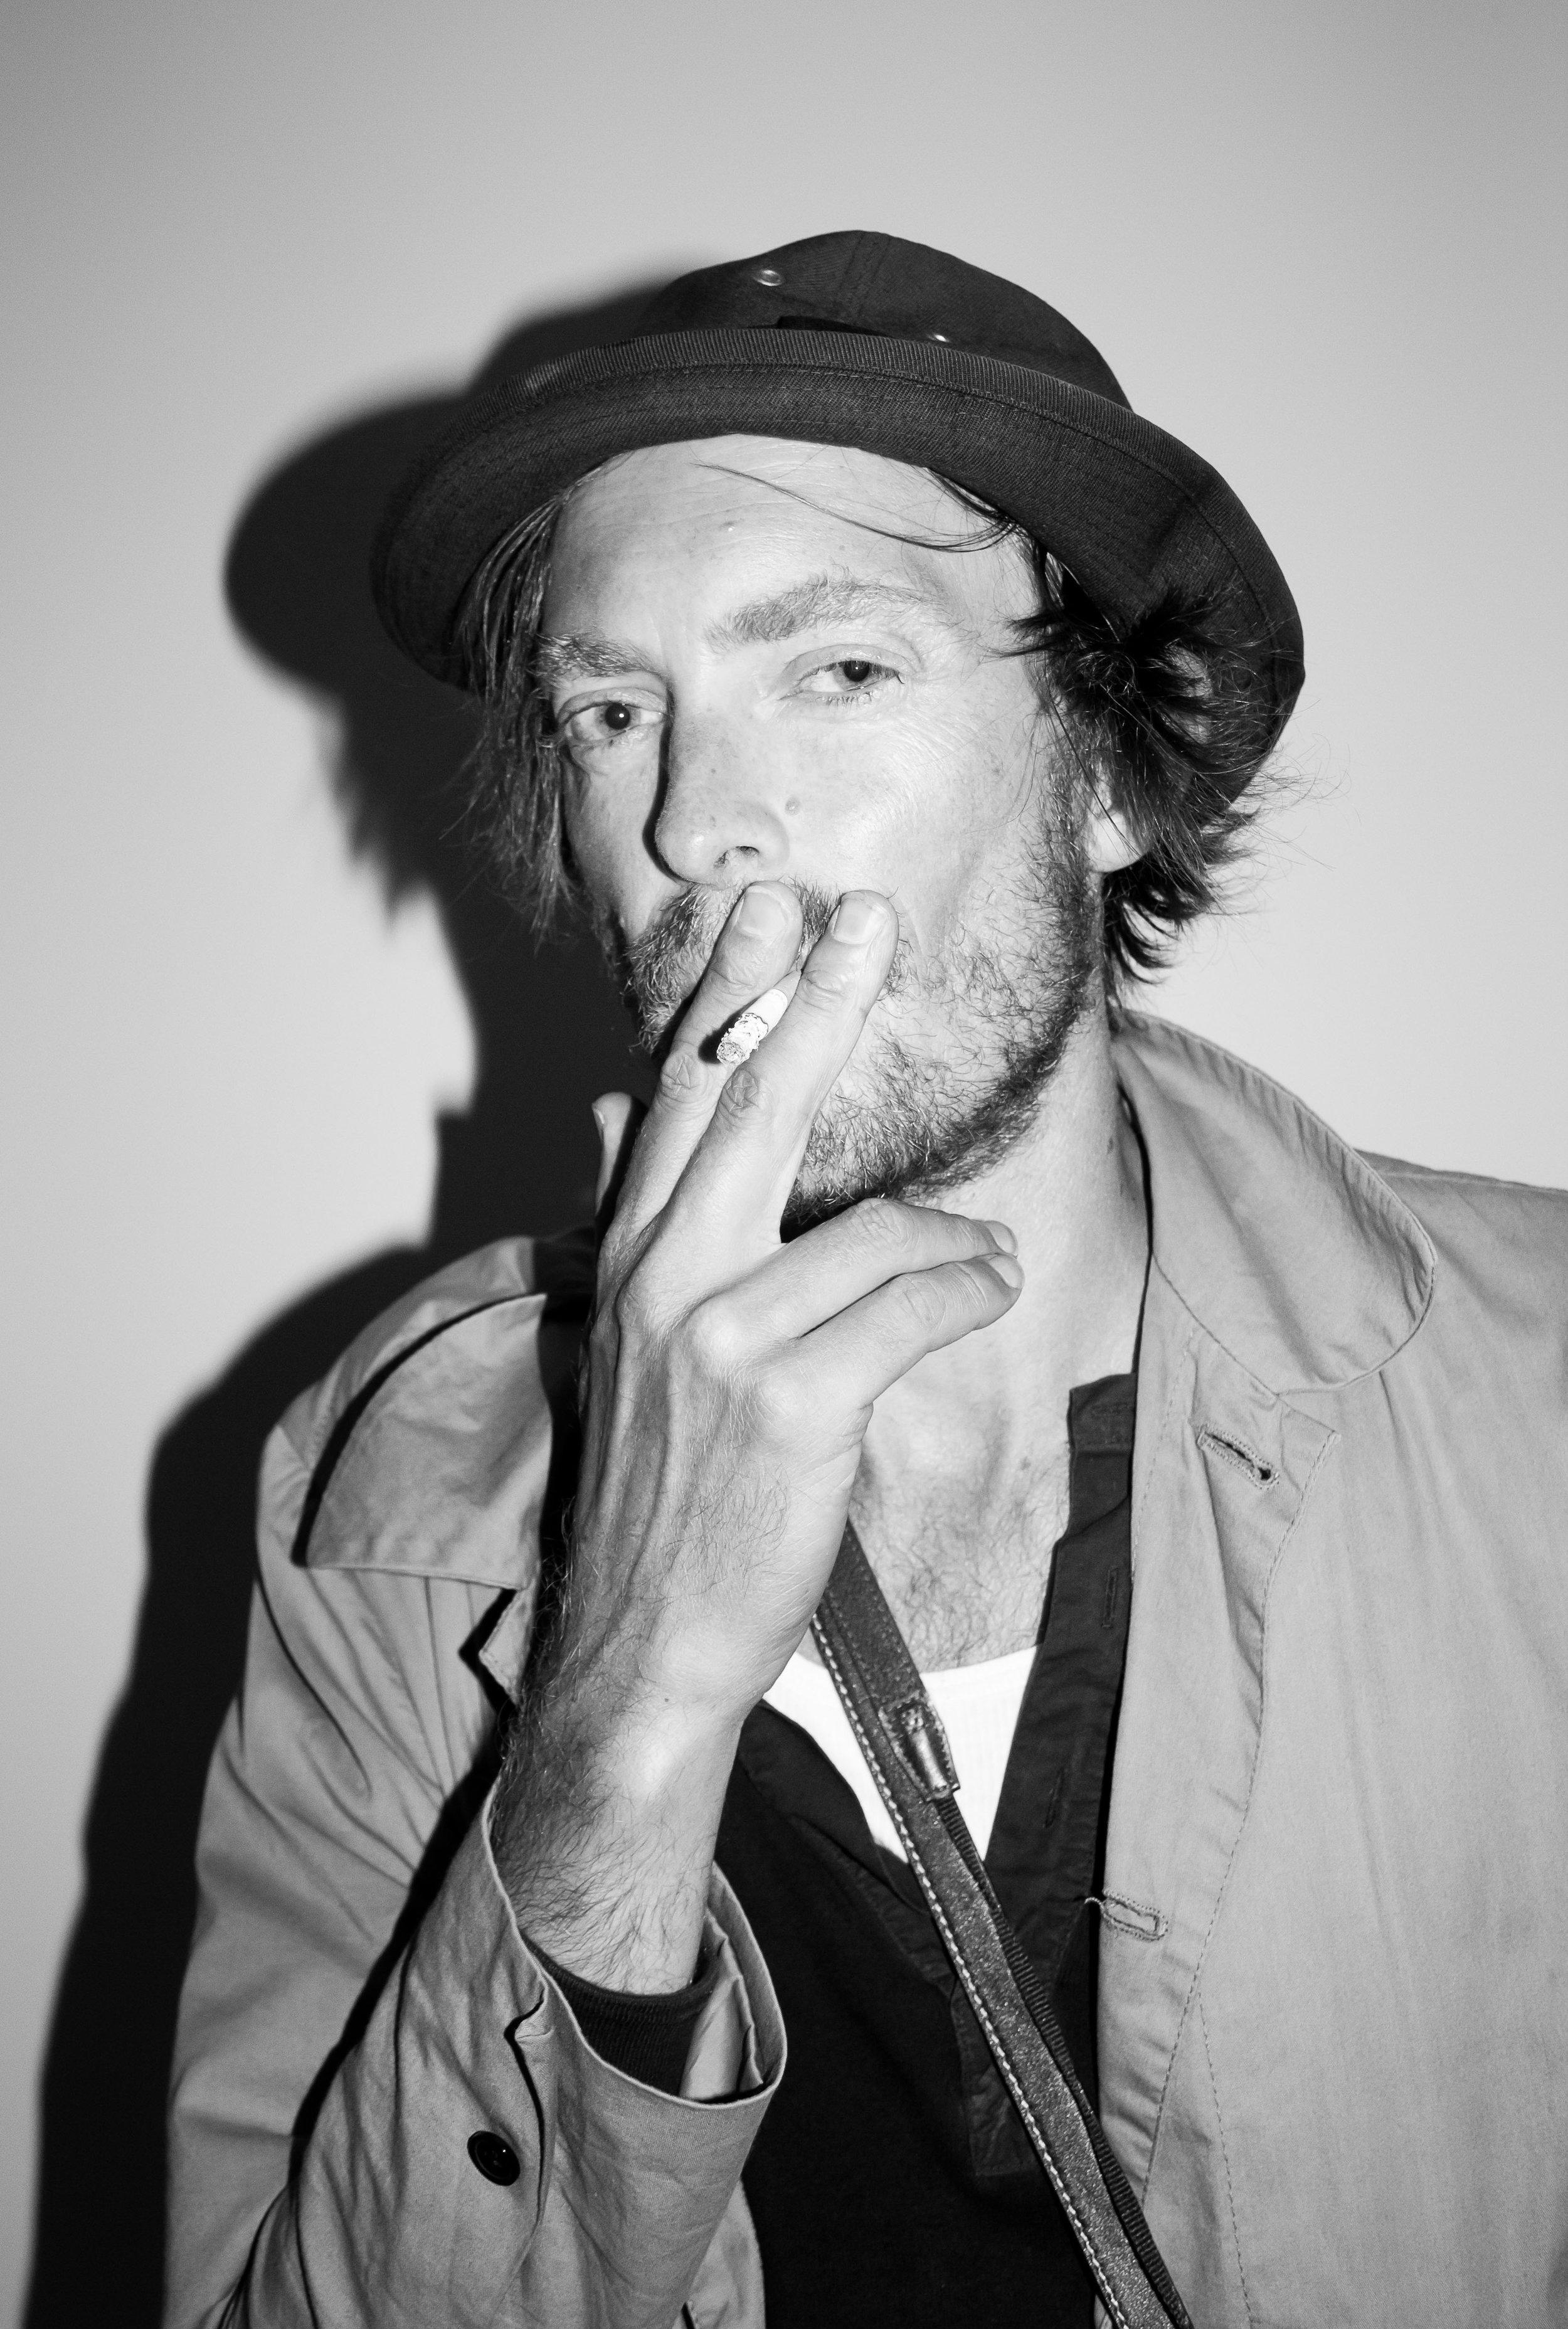 Henrik Vibskov by Kemara Pol at Copenhagen Fashion Week, Portrait, Denmark, Agency, Black and White, Editorial, Lookbook